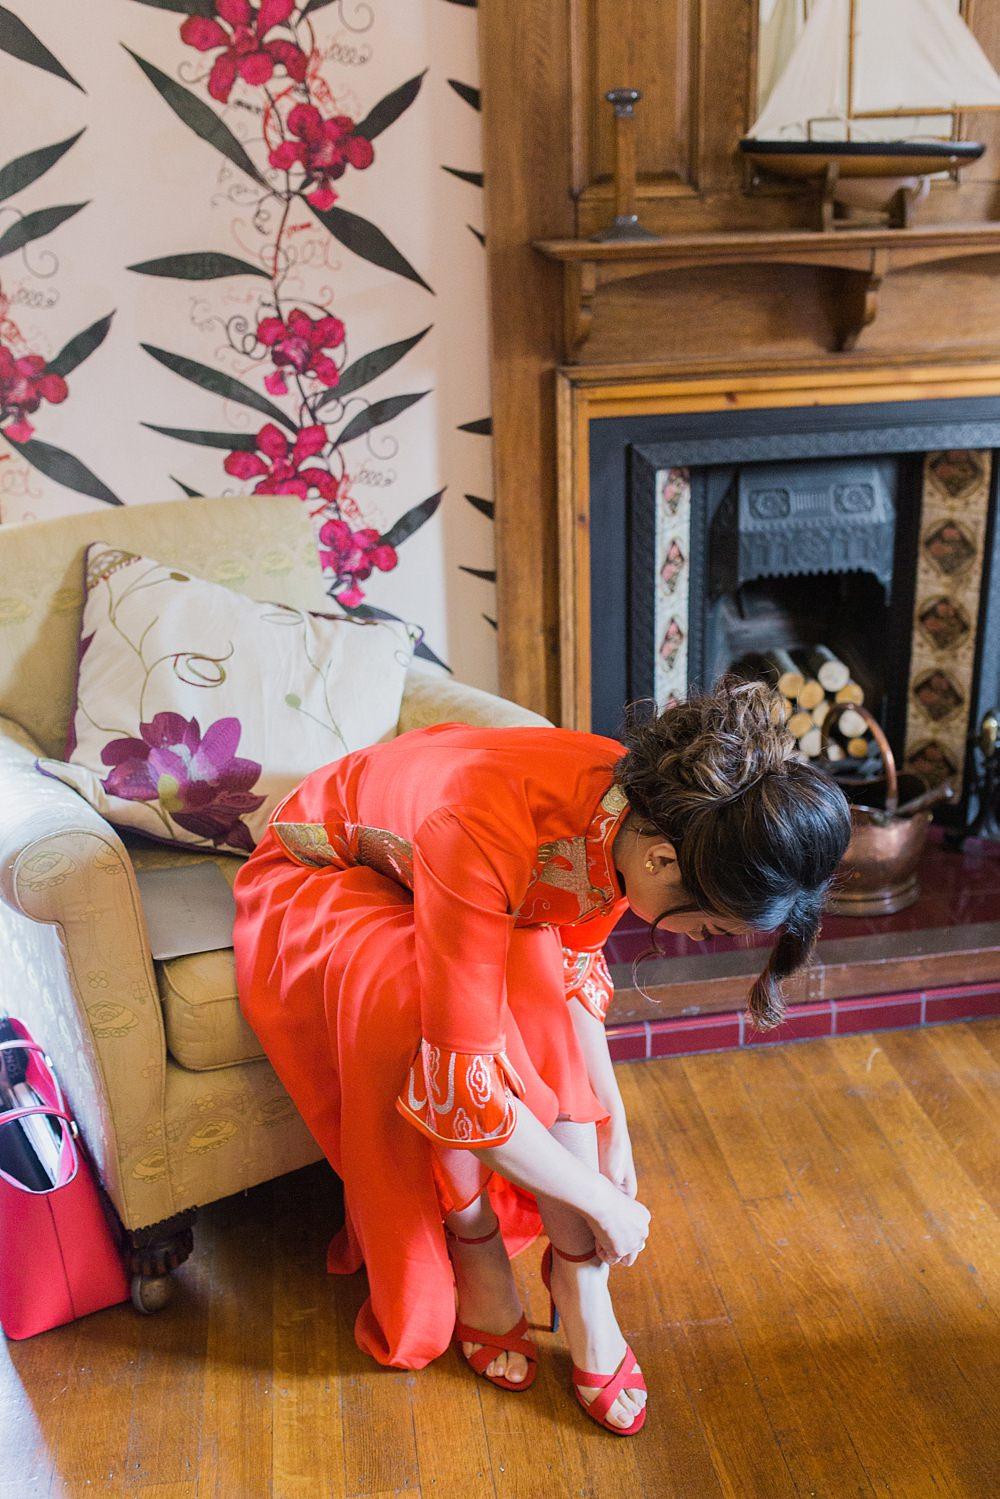 Fine Art Wedding Photographers,Glasgow wedding,The Gibsons,elegant wedding photographers glasgow,elopements scotland,lochside wedding,natural wedding photographers,romantic photographers Scotland,soft wedding photographers,wedding lodge on loch goil,weddings scotland,